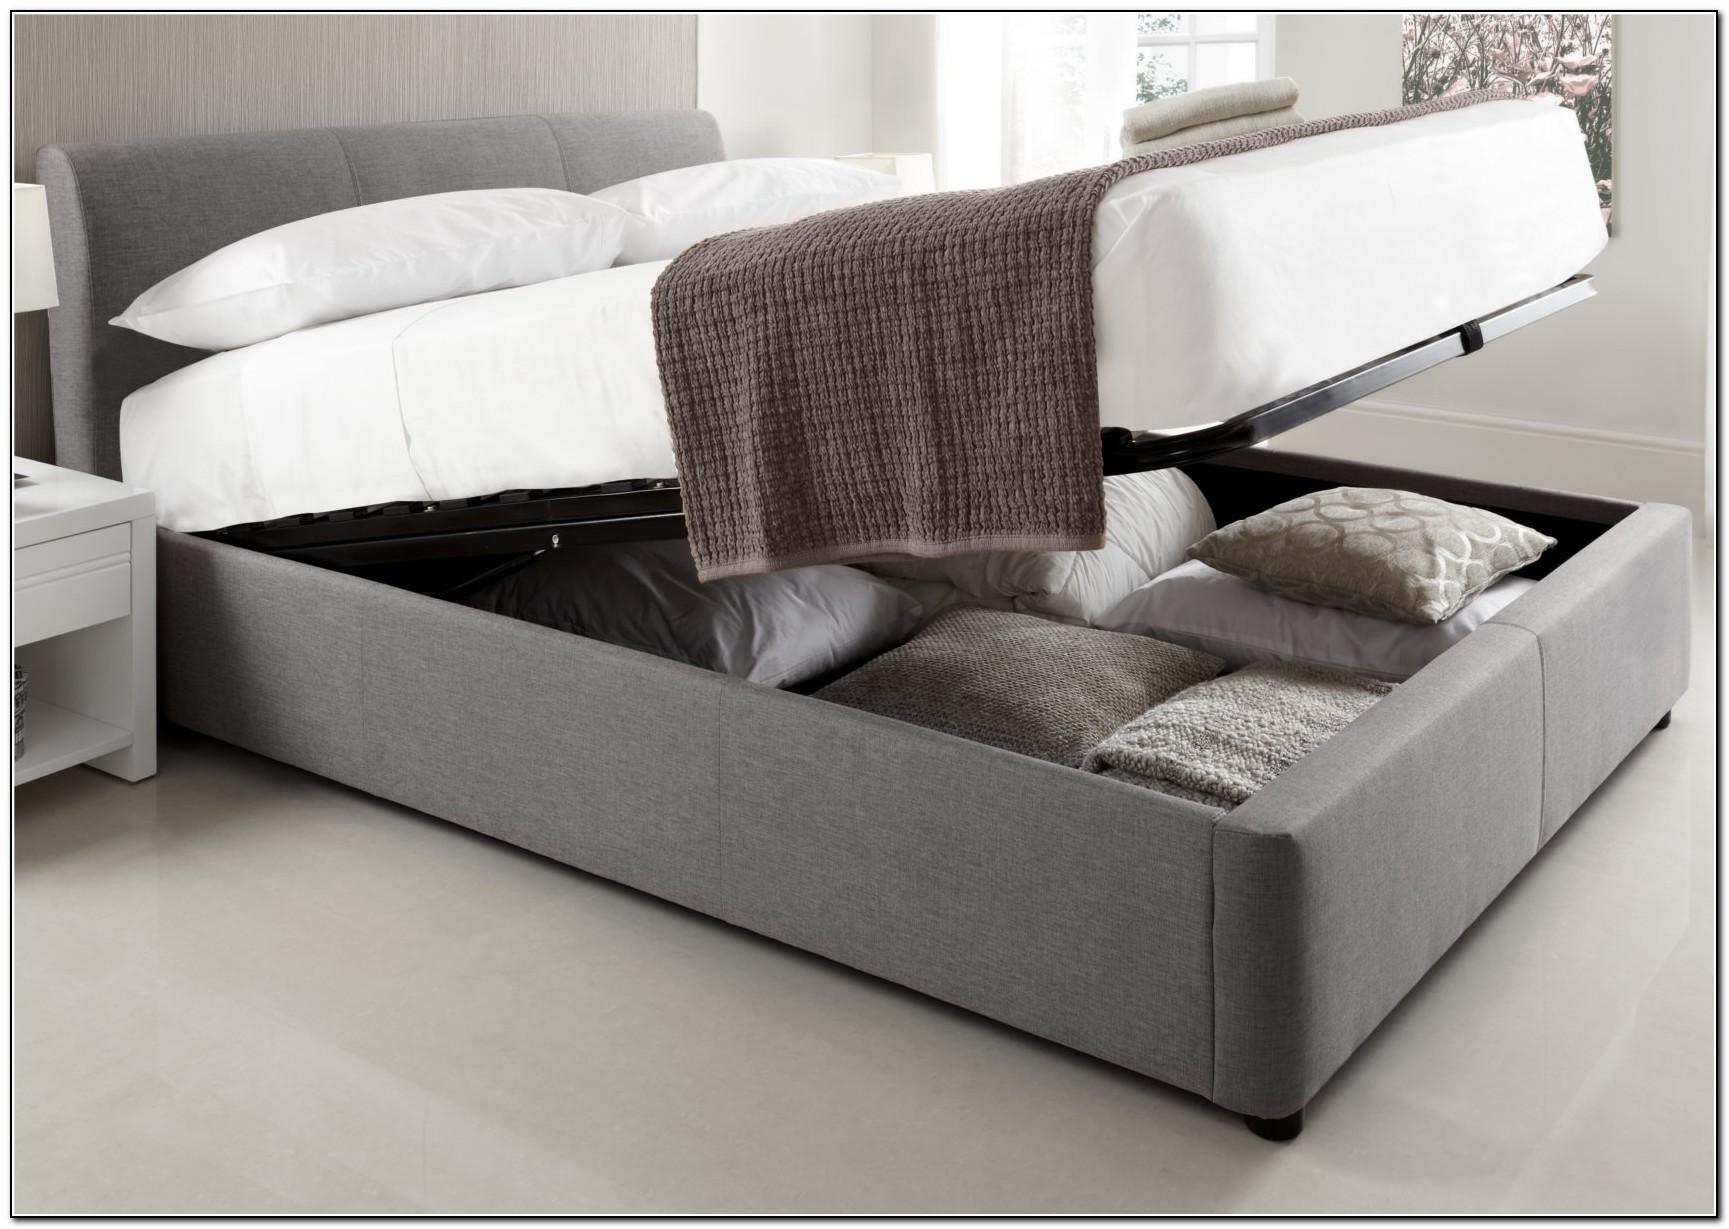 Grey Upholstered King Bed